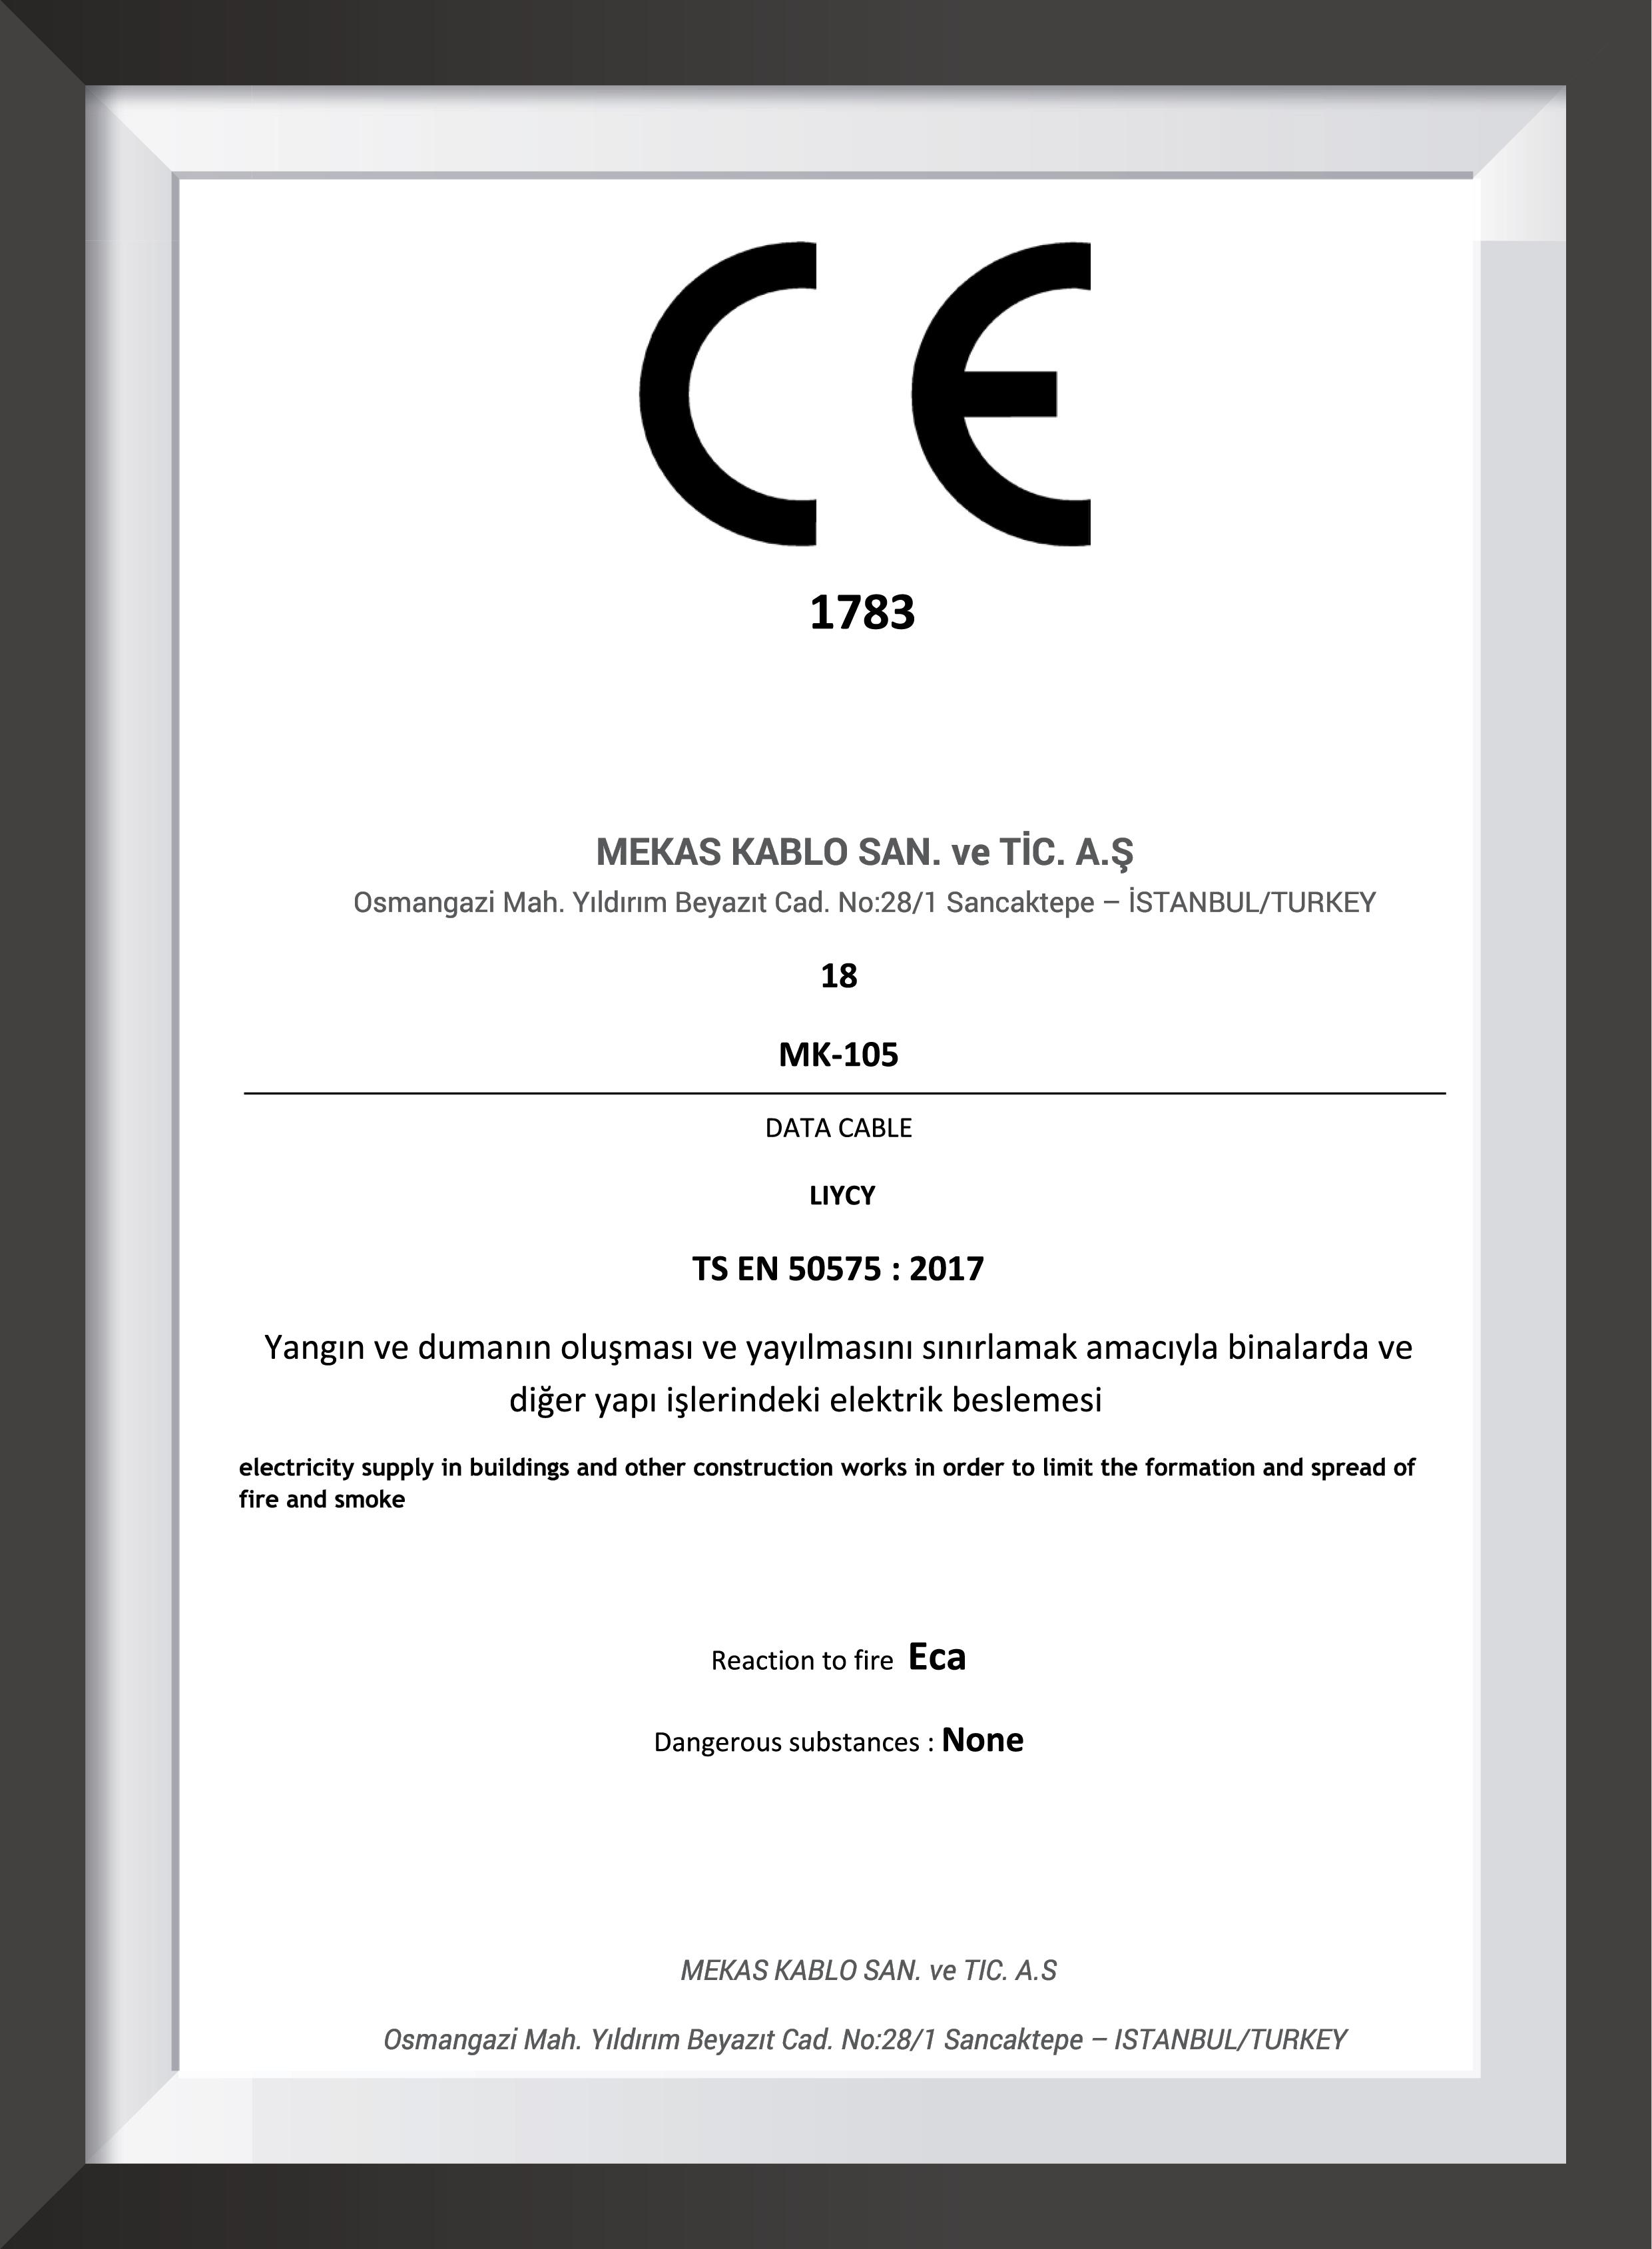 mekas kablo CE 1783